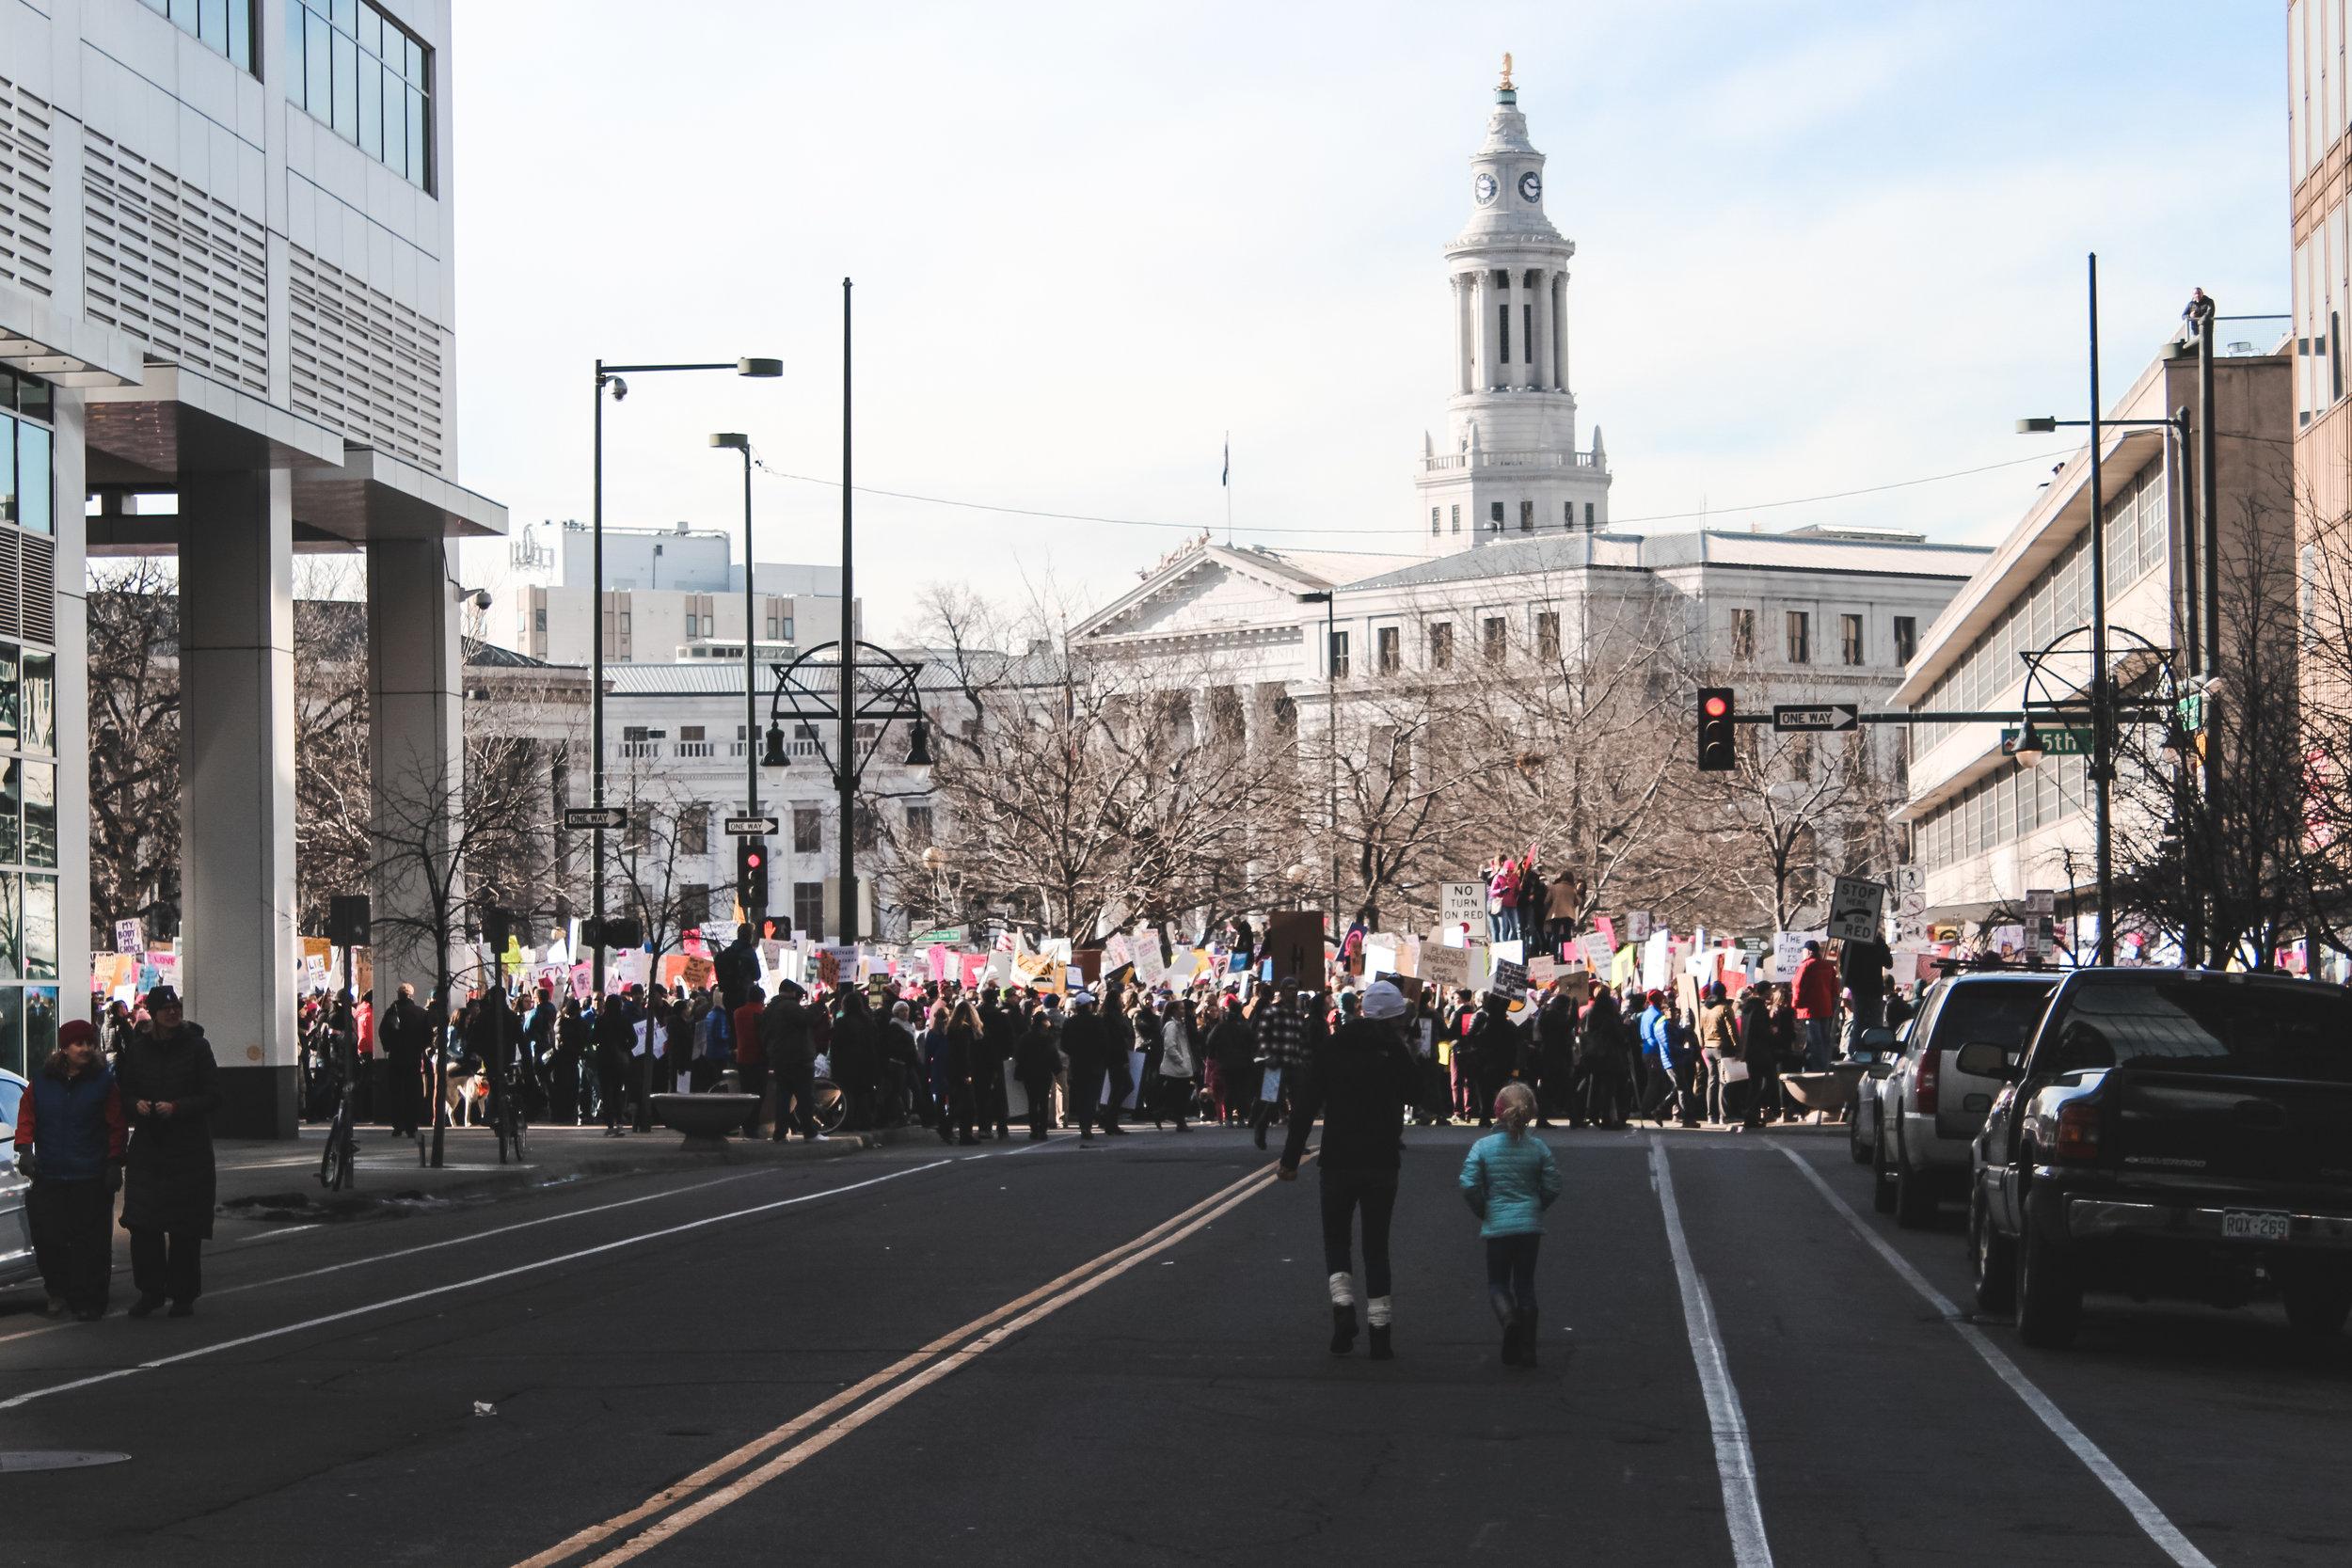 Women's March - Denver, COJanuary 20, 2017